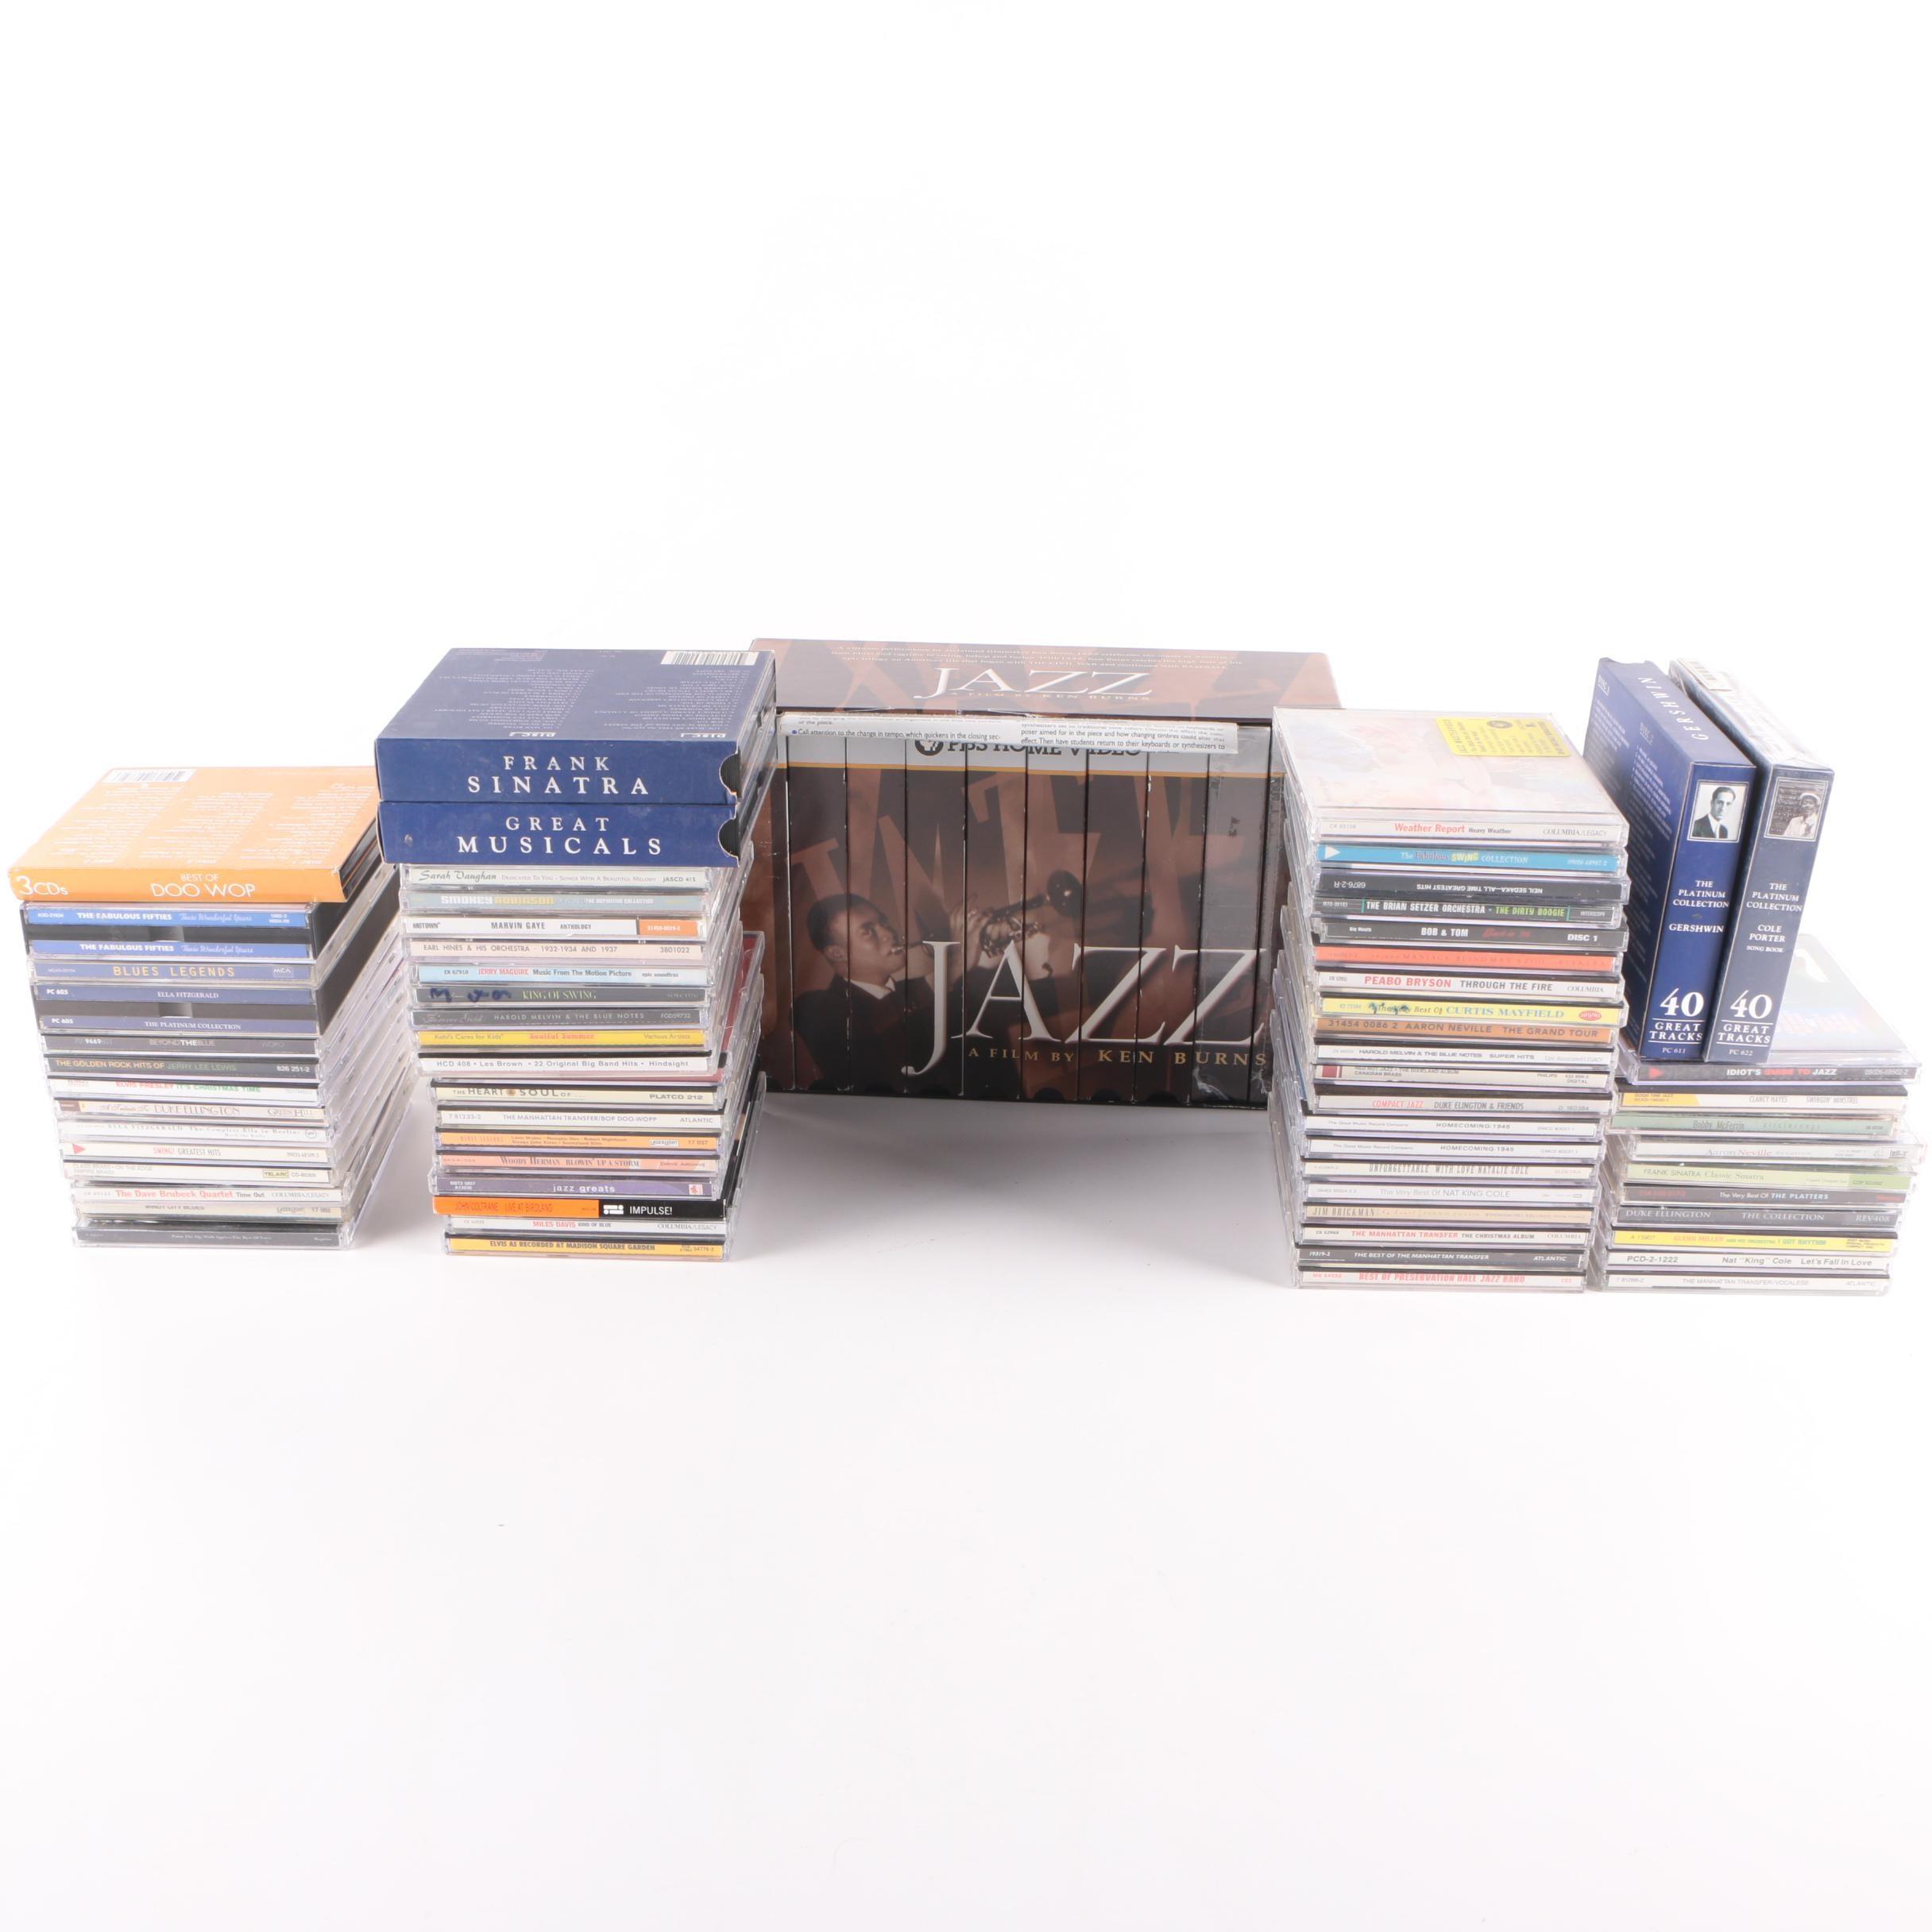 "Ken Burns ""Jazz"" VHS Box Set And Jazz, Blues, Doo-Wop And More CDs"